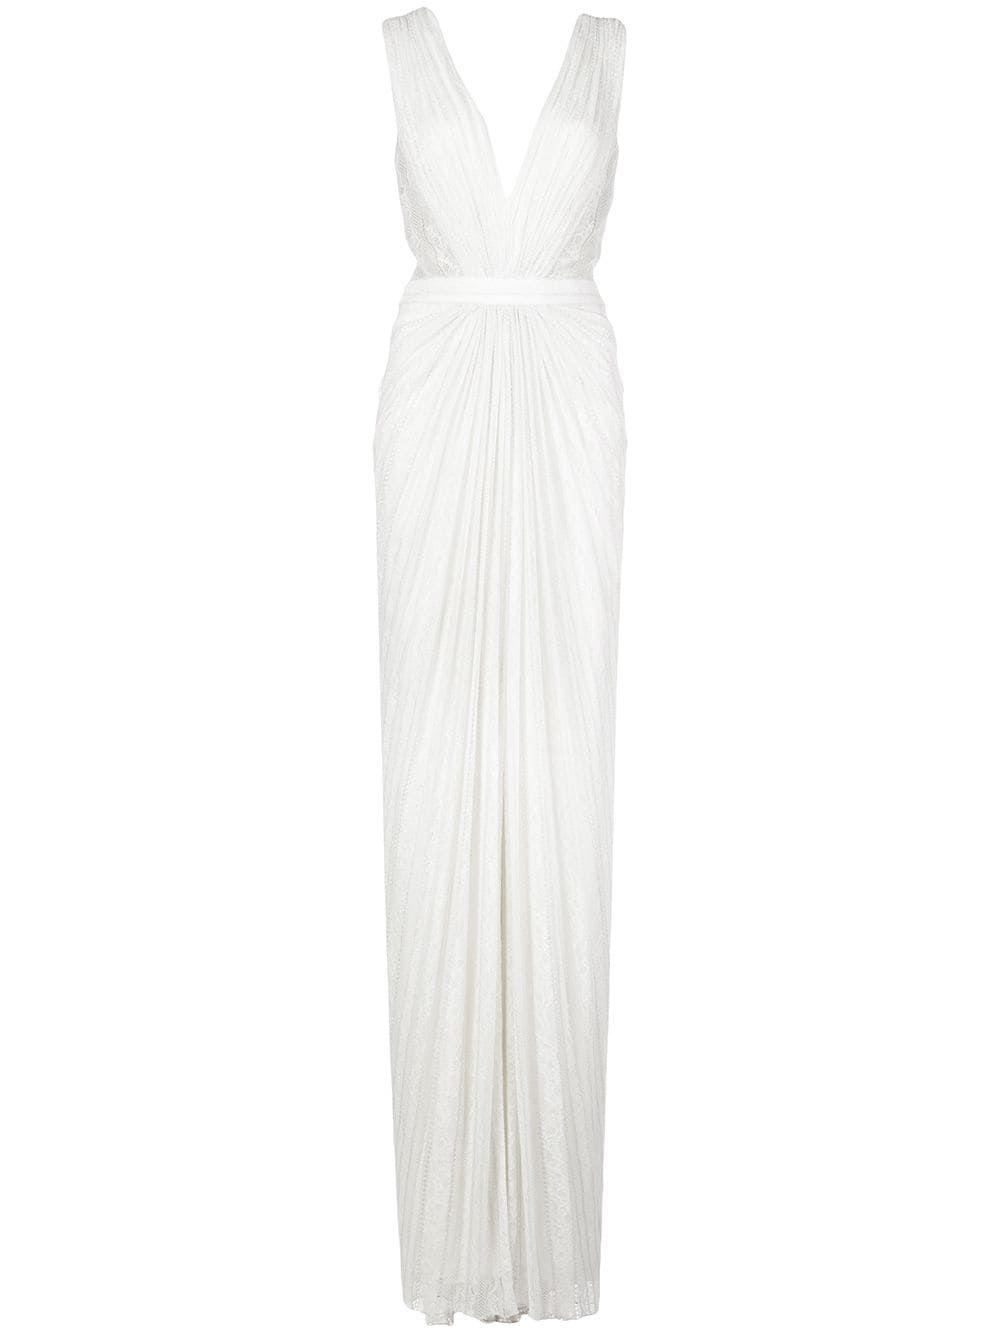 Tadashi Shoji Killian Lace Dress Farfetch In 2021 Dresses White Bridesmaid Dresses Lace White Dress [ 1334 x 1000 Pixel ]